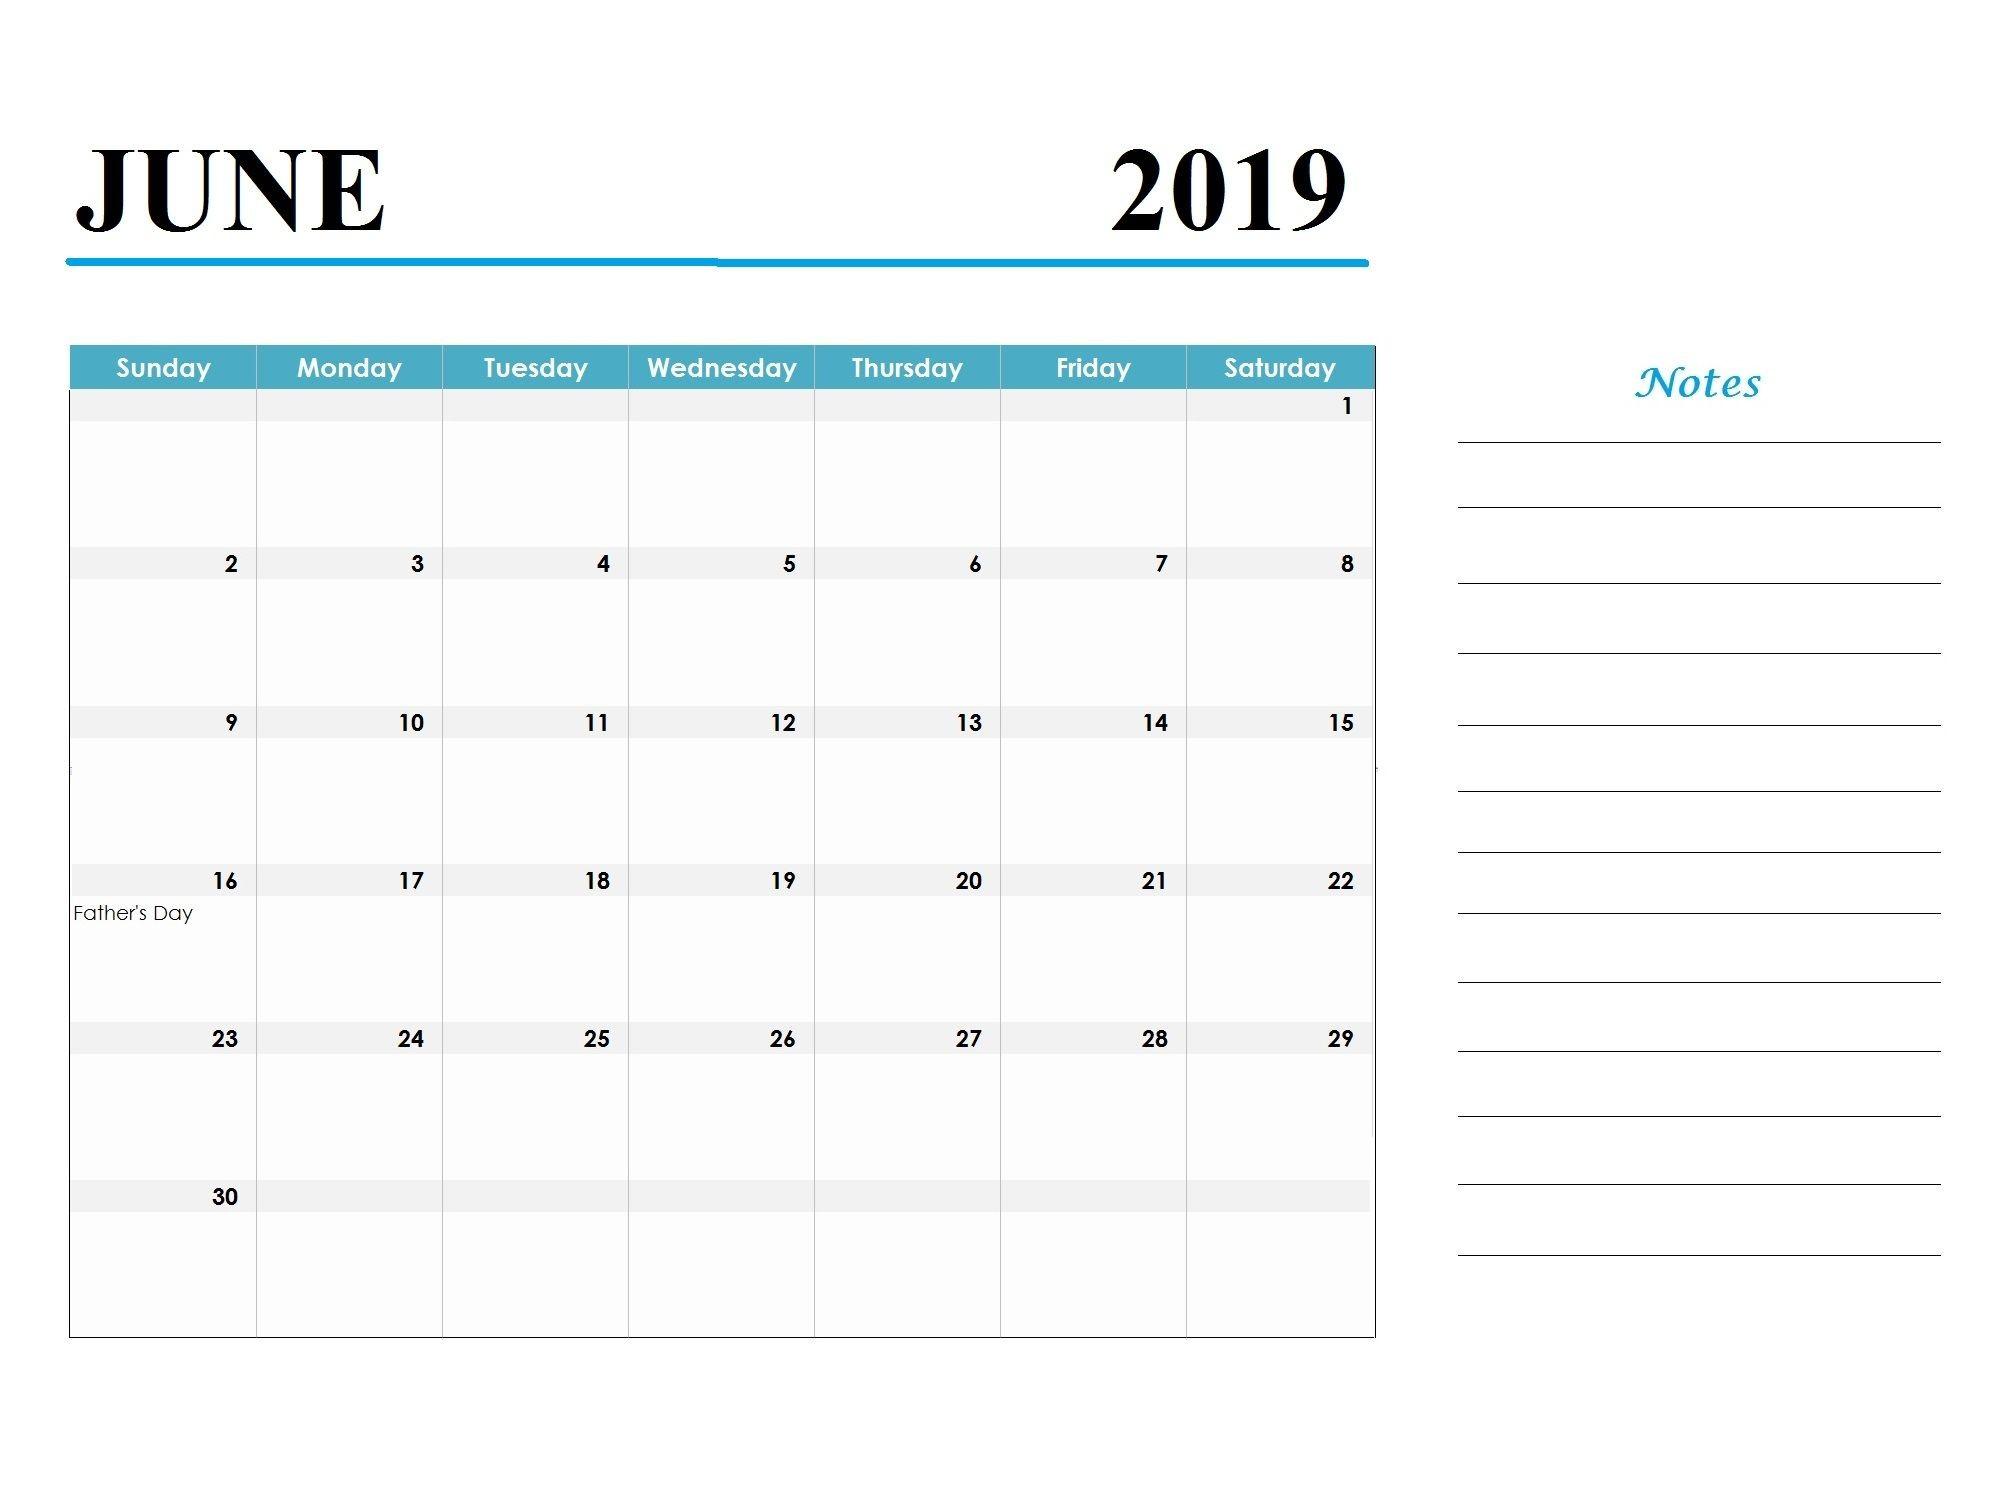 Cute June 2019 Calendar Floral Images